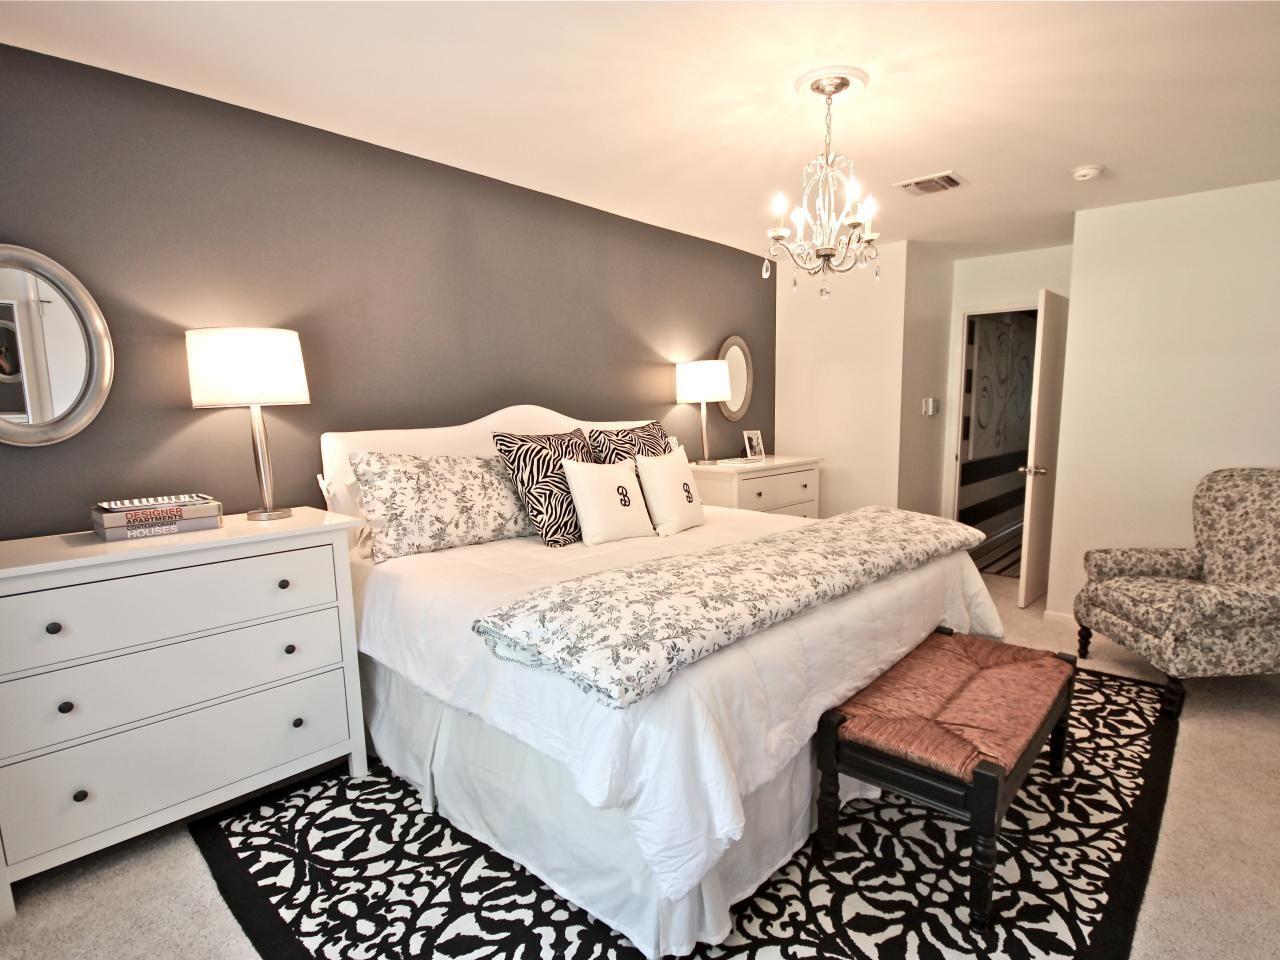 Budget Bedroom Designs Couples Bedroom Colors Small Master Bedroom Master Bedrooms Decor